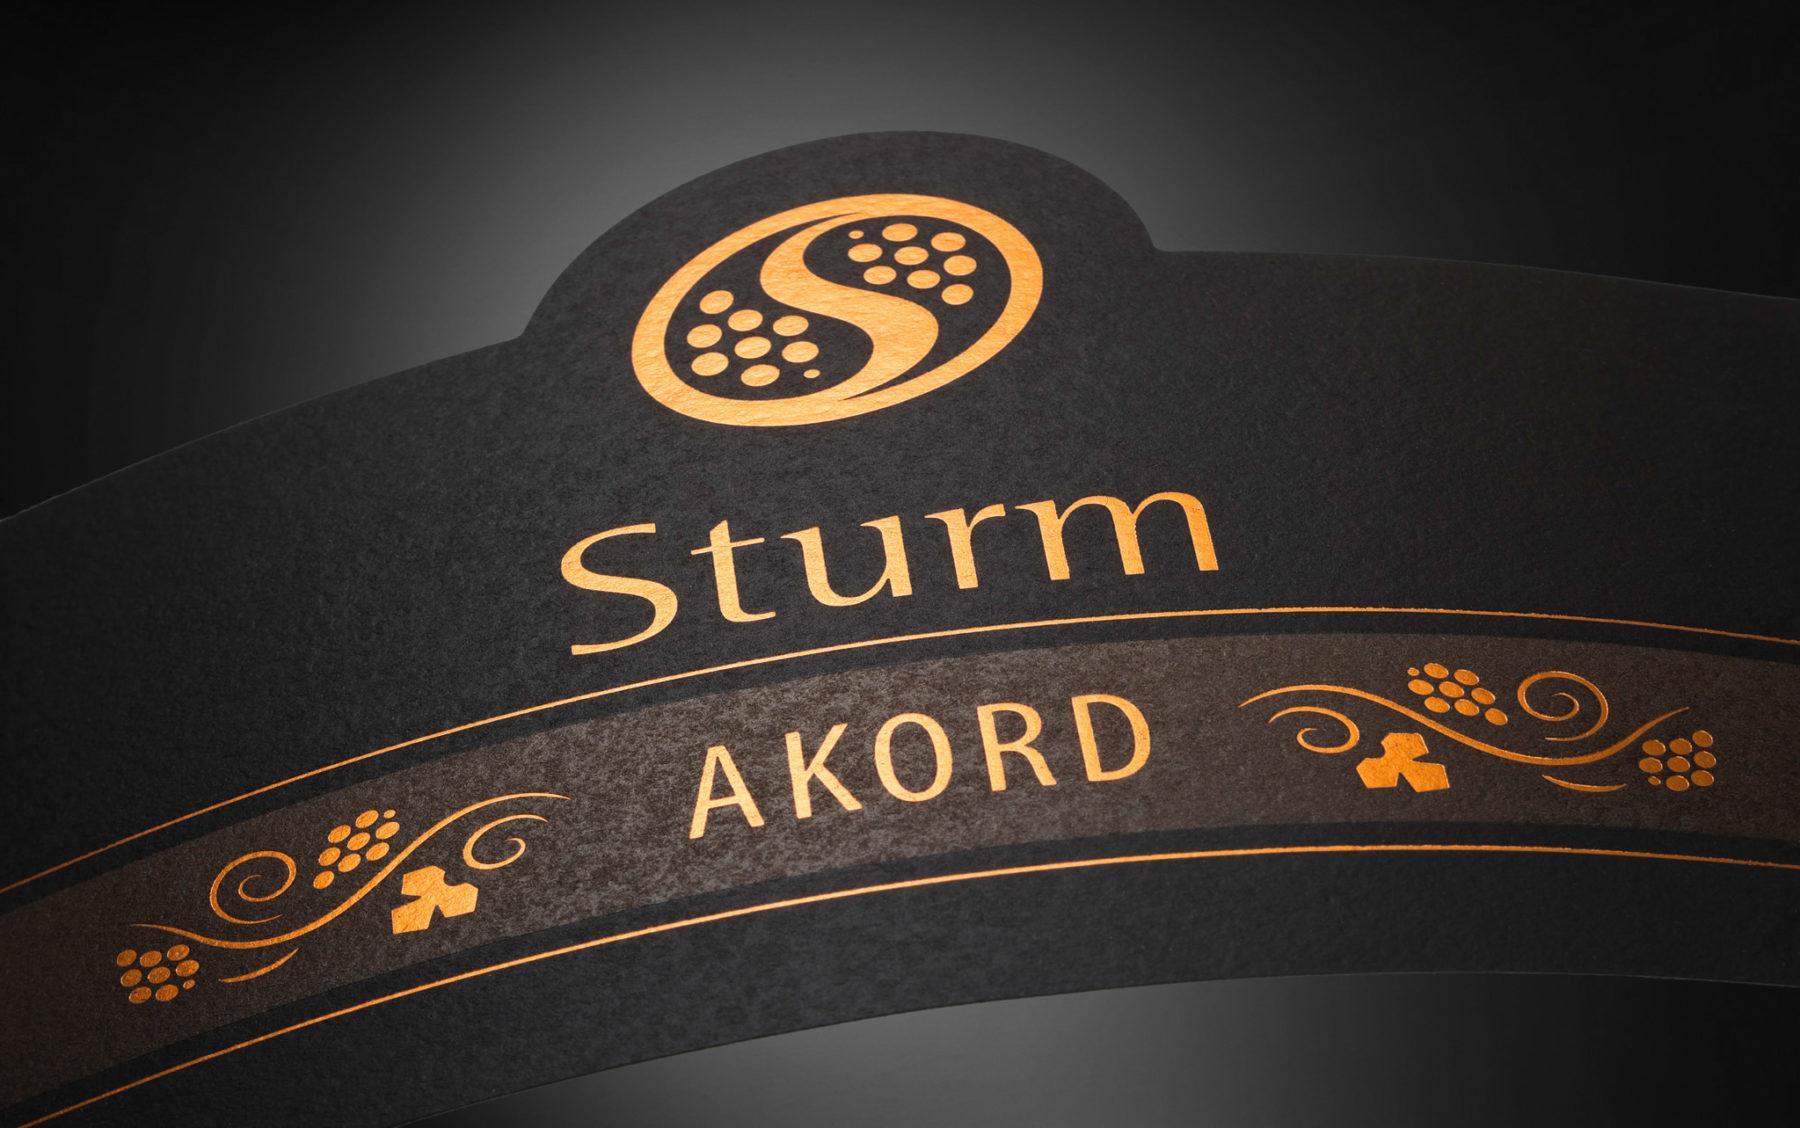 Sturm (Šturm) - etiketa za vino Akord. · Fotografija: Marijan Močivnik, 2017